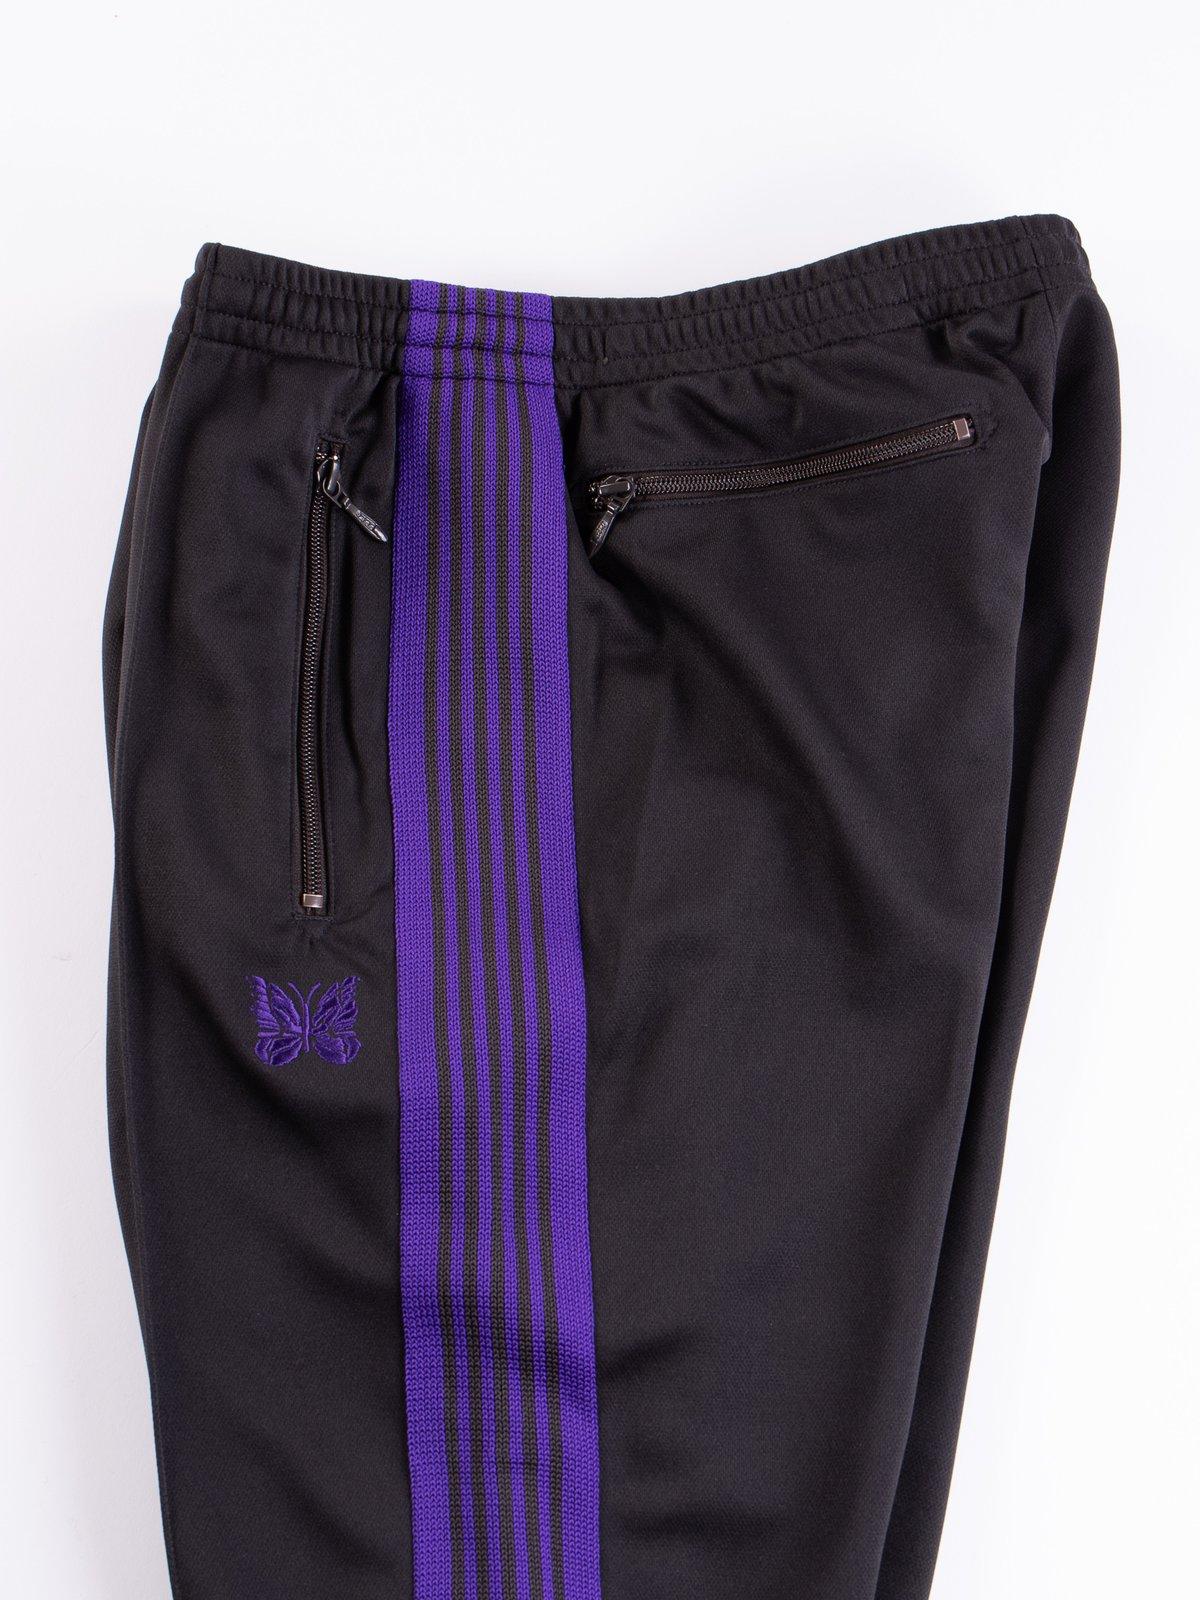 Charcoal Narrow Track Pant - Image 7